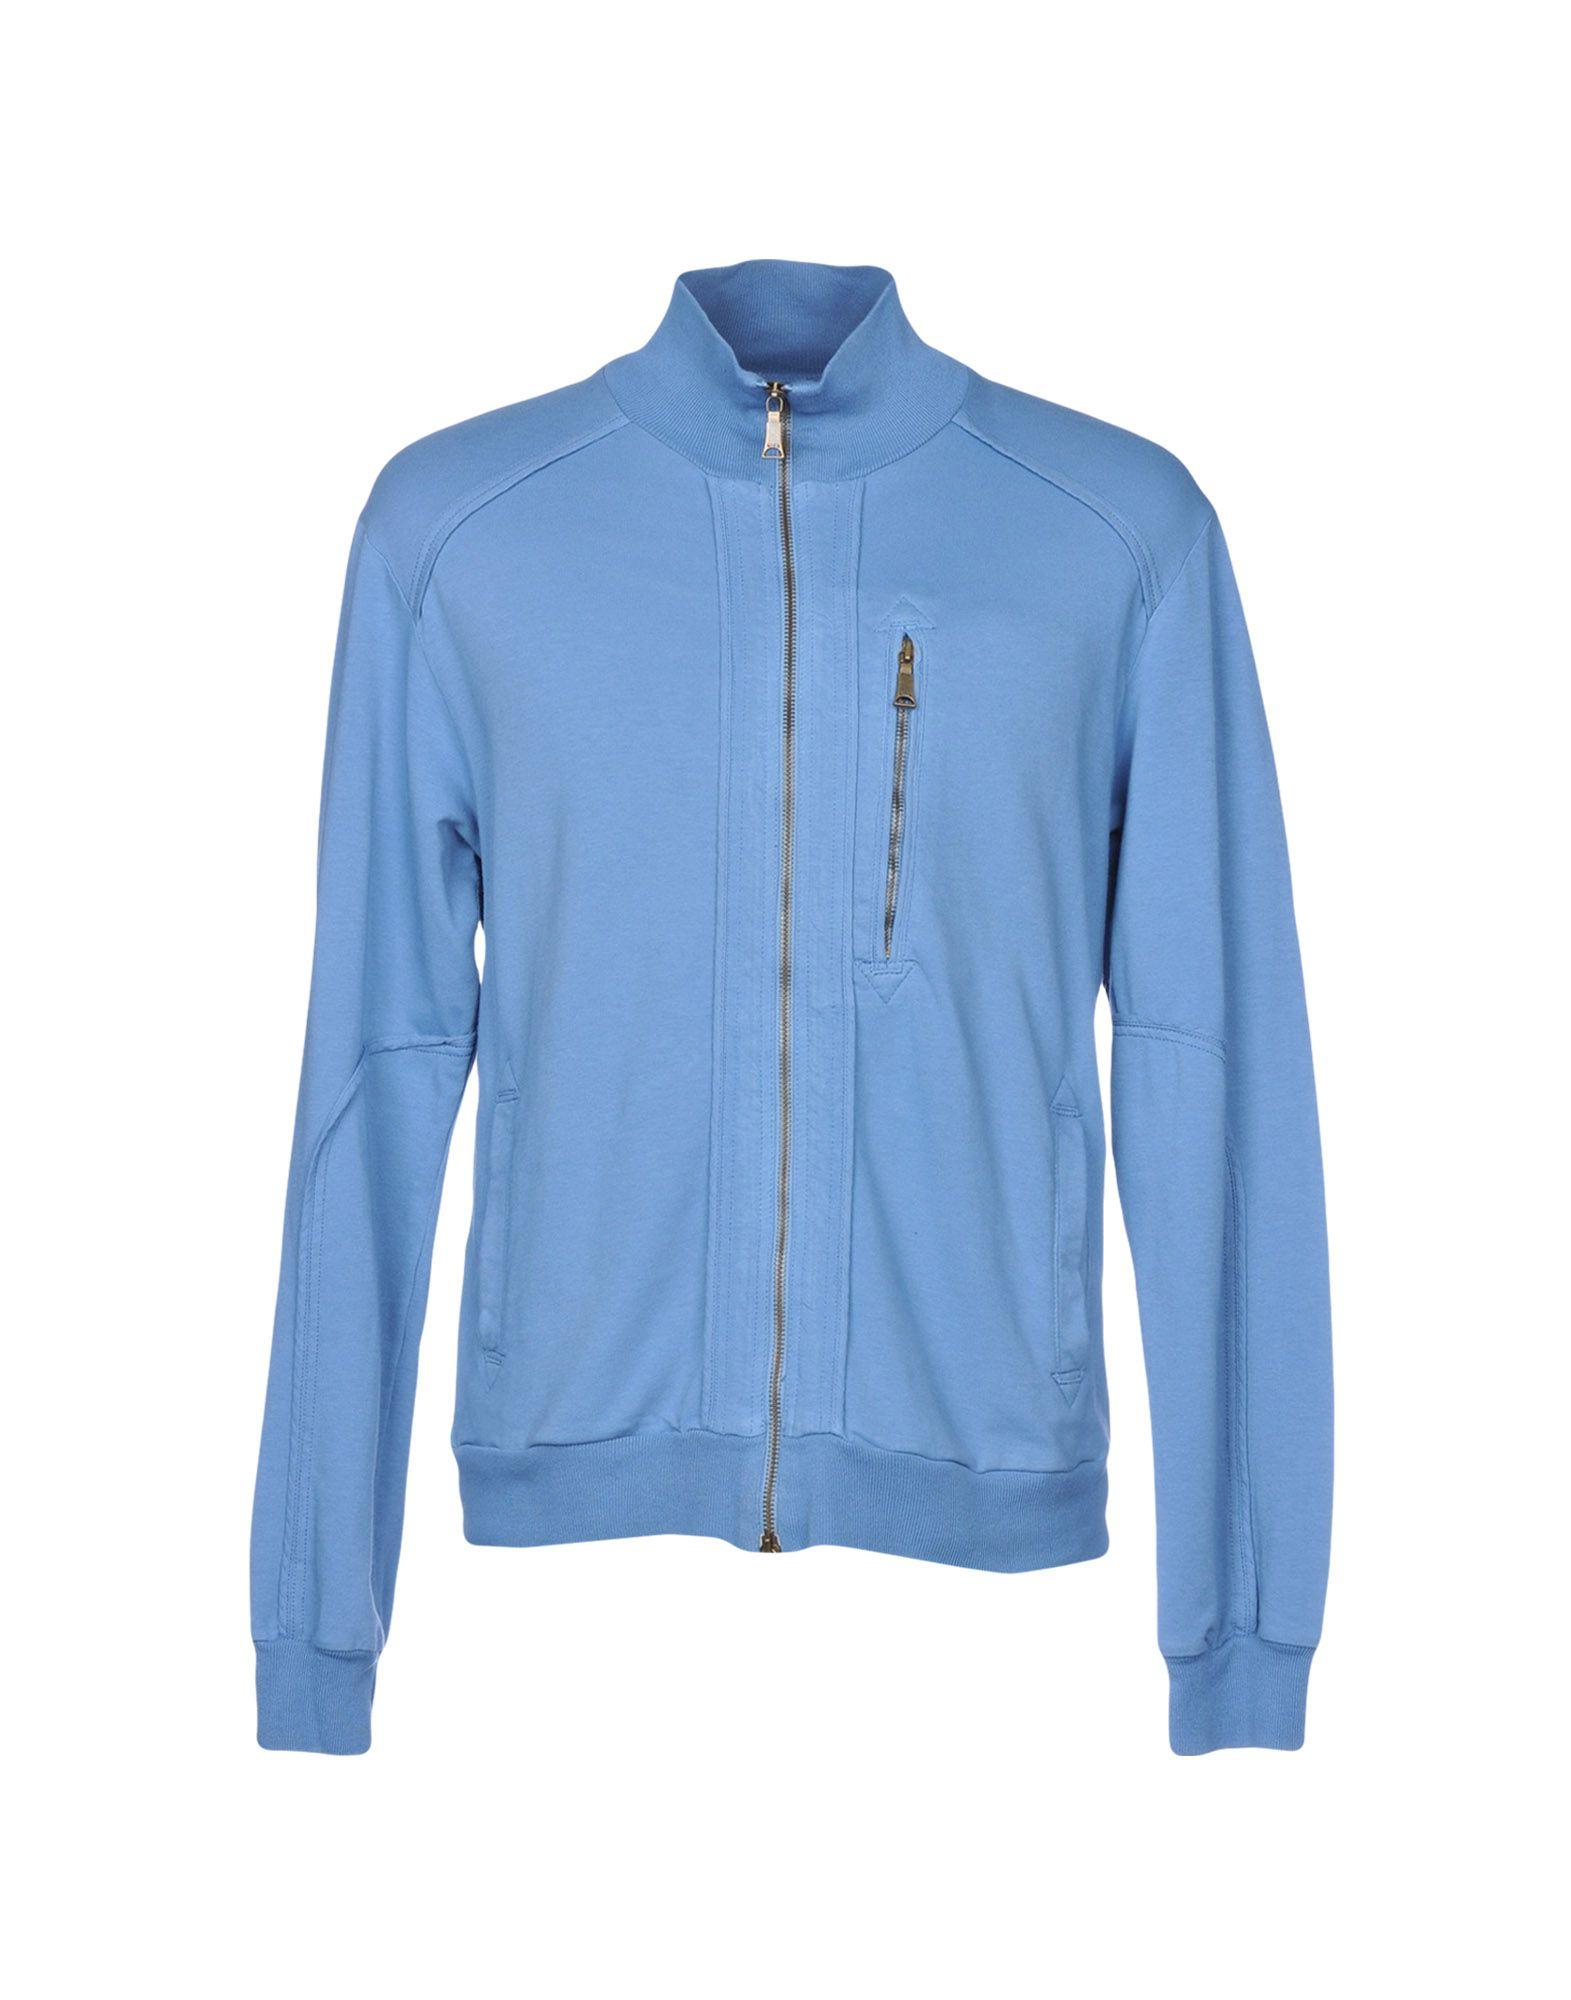 RICHMOND DENIM Sweatshirt in Sky Blue